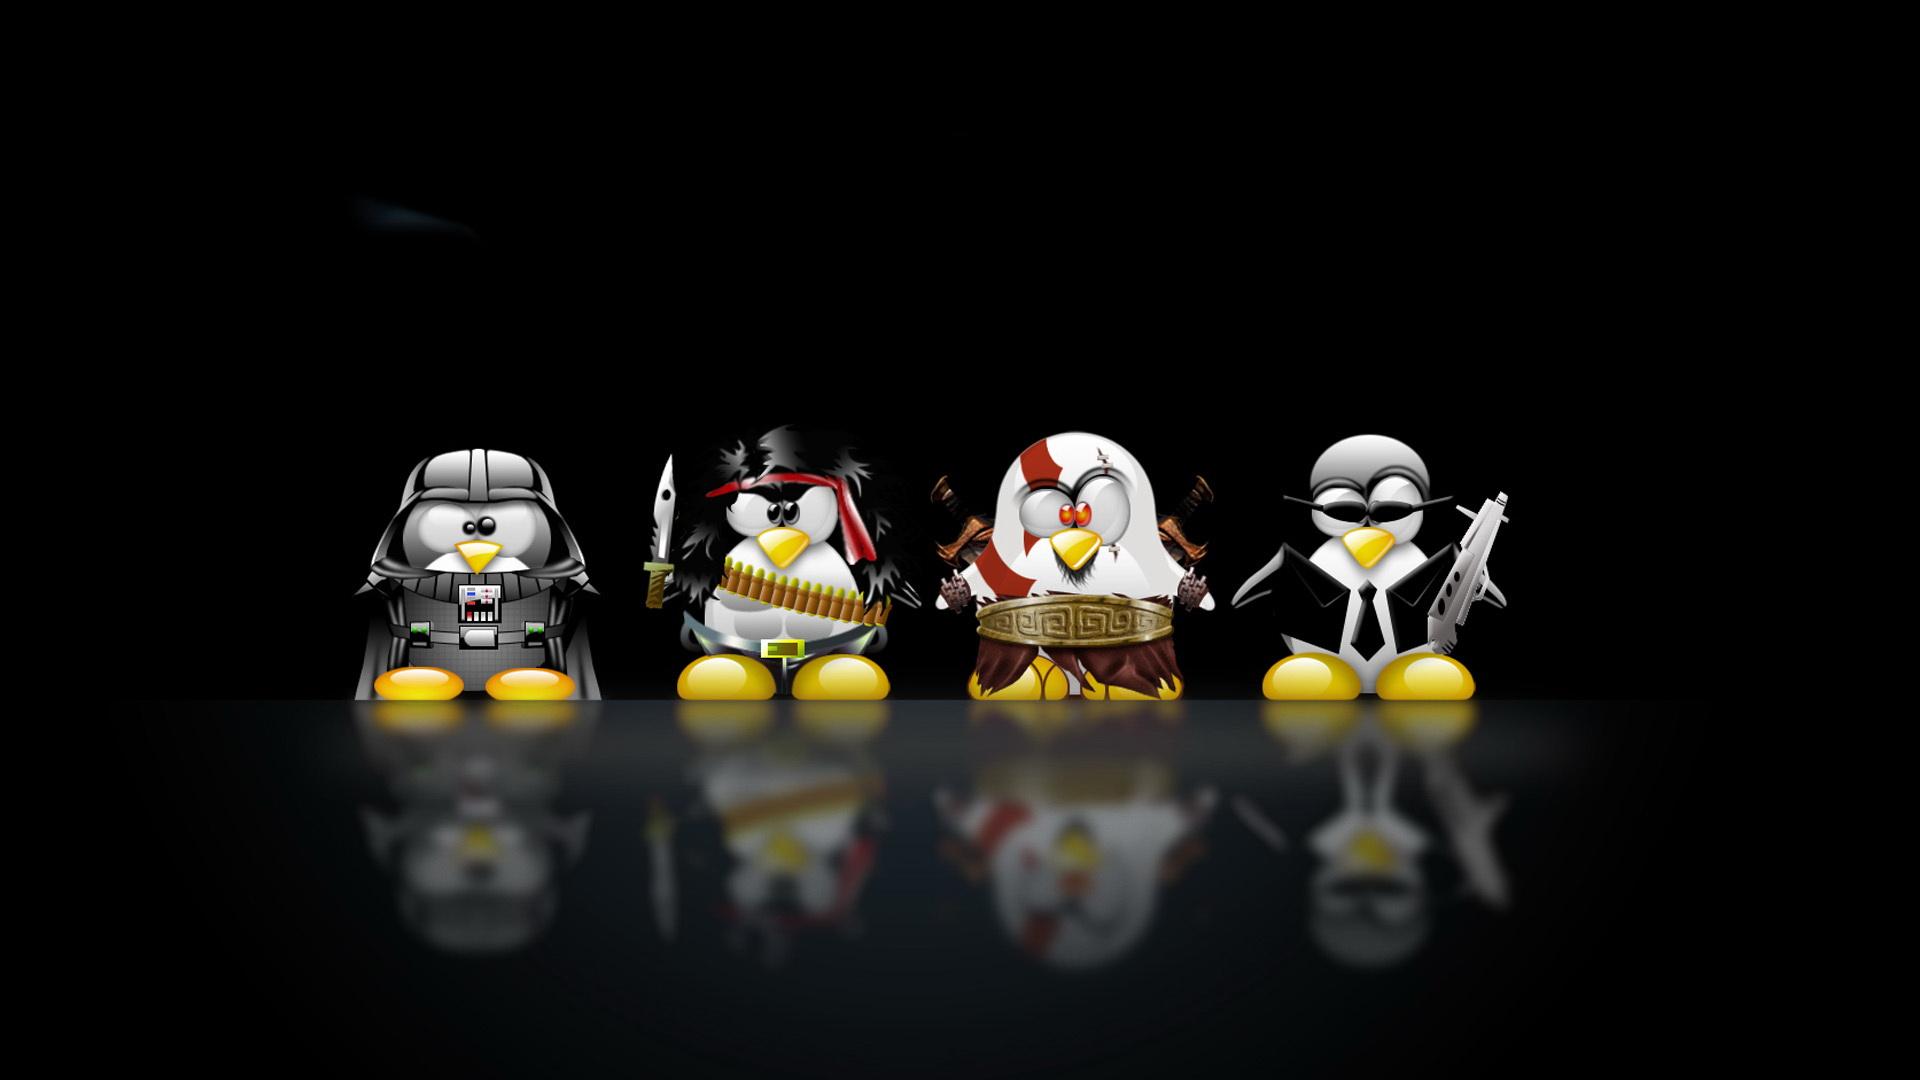 linux desktop wallpaper hd linux background download Car Pictures 1920x1080